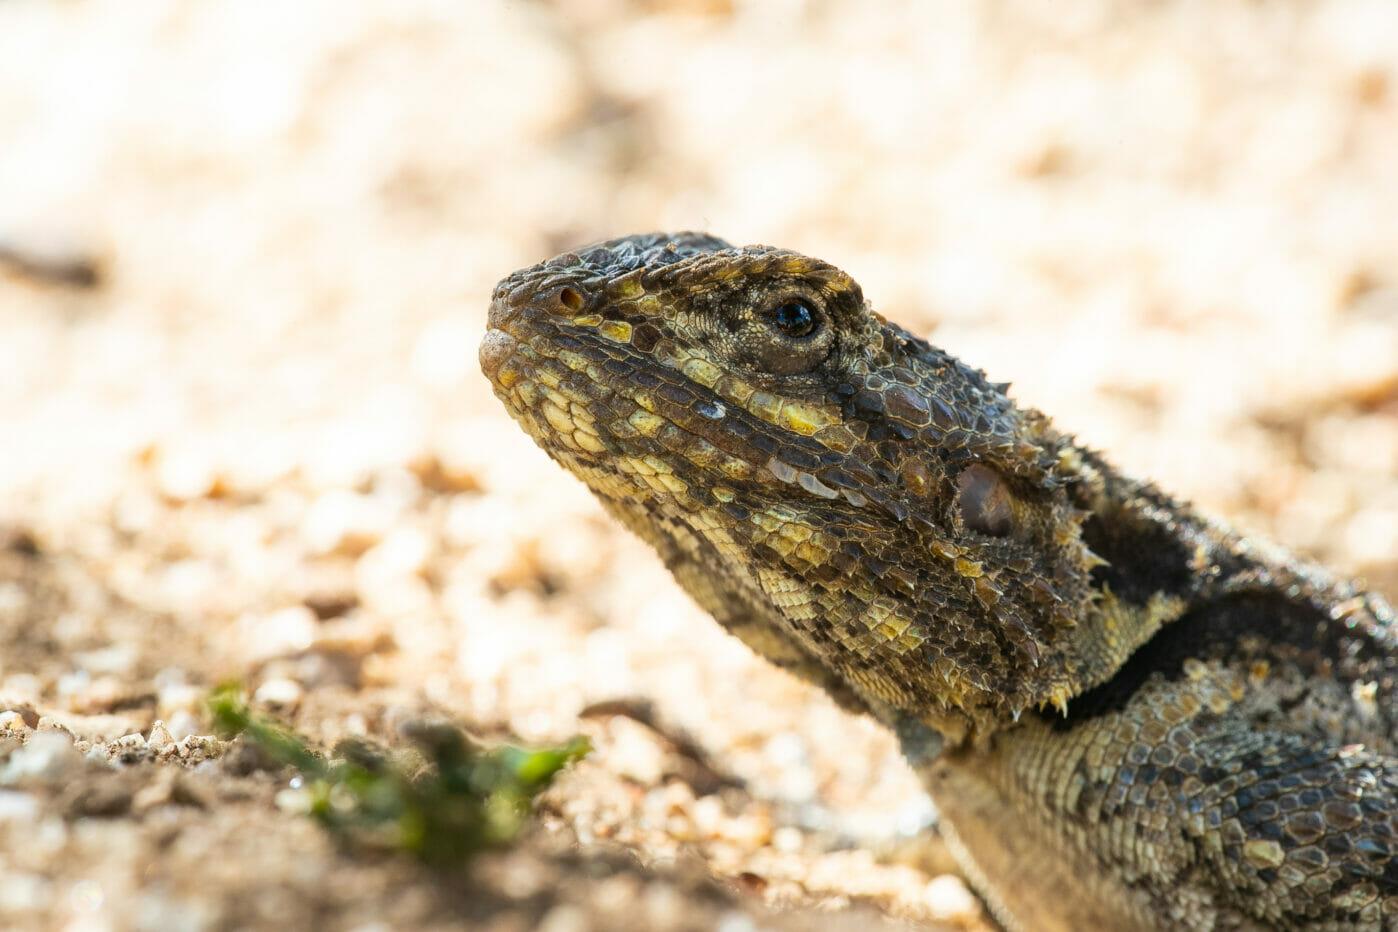 Agama Reptile Lizard